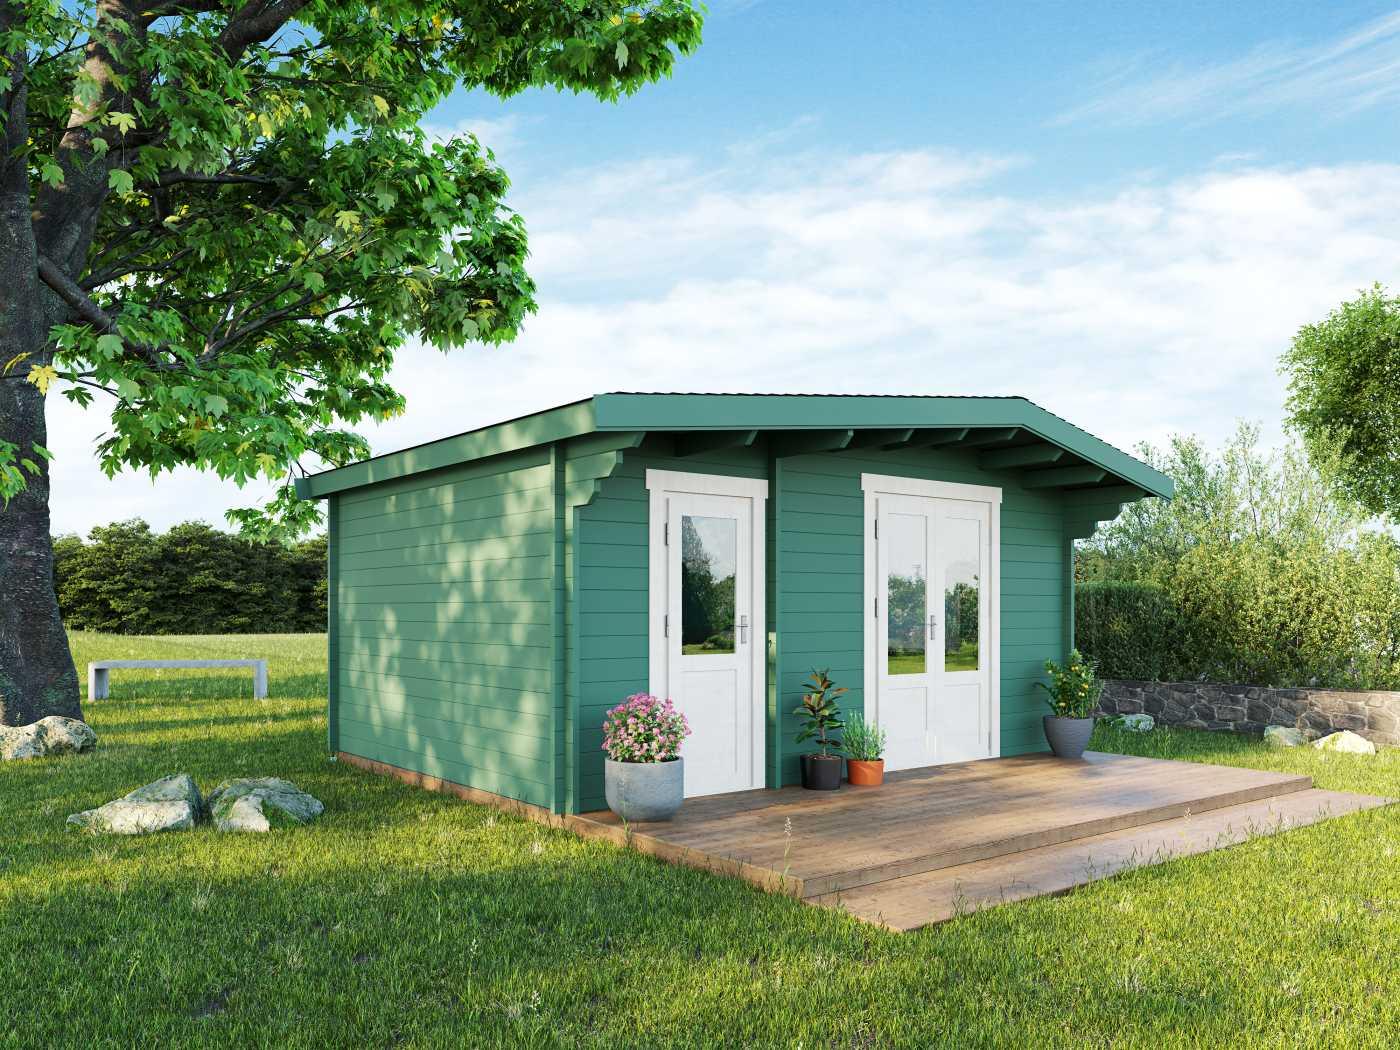 The 'Devon Log Cabin' in a summer garden setting